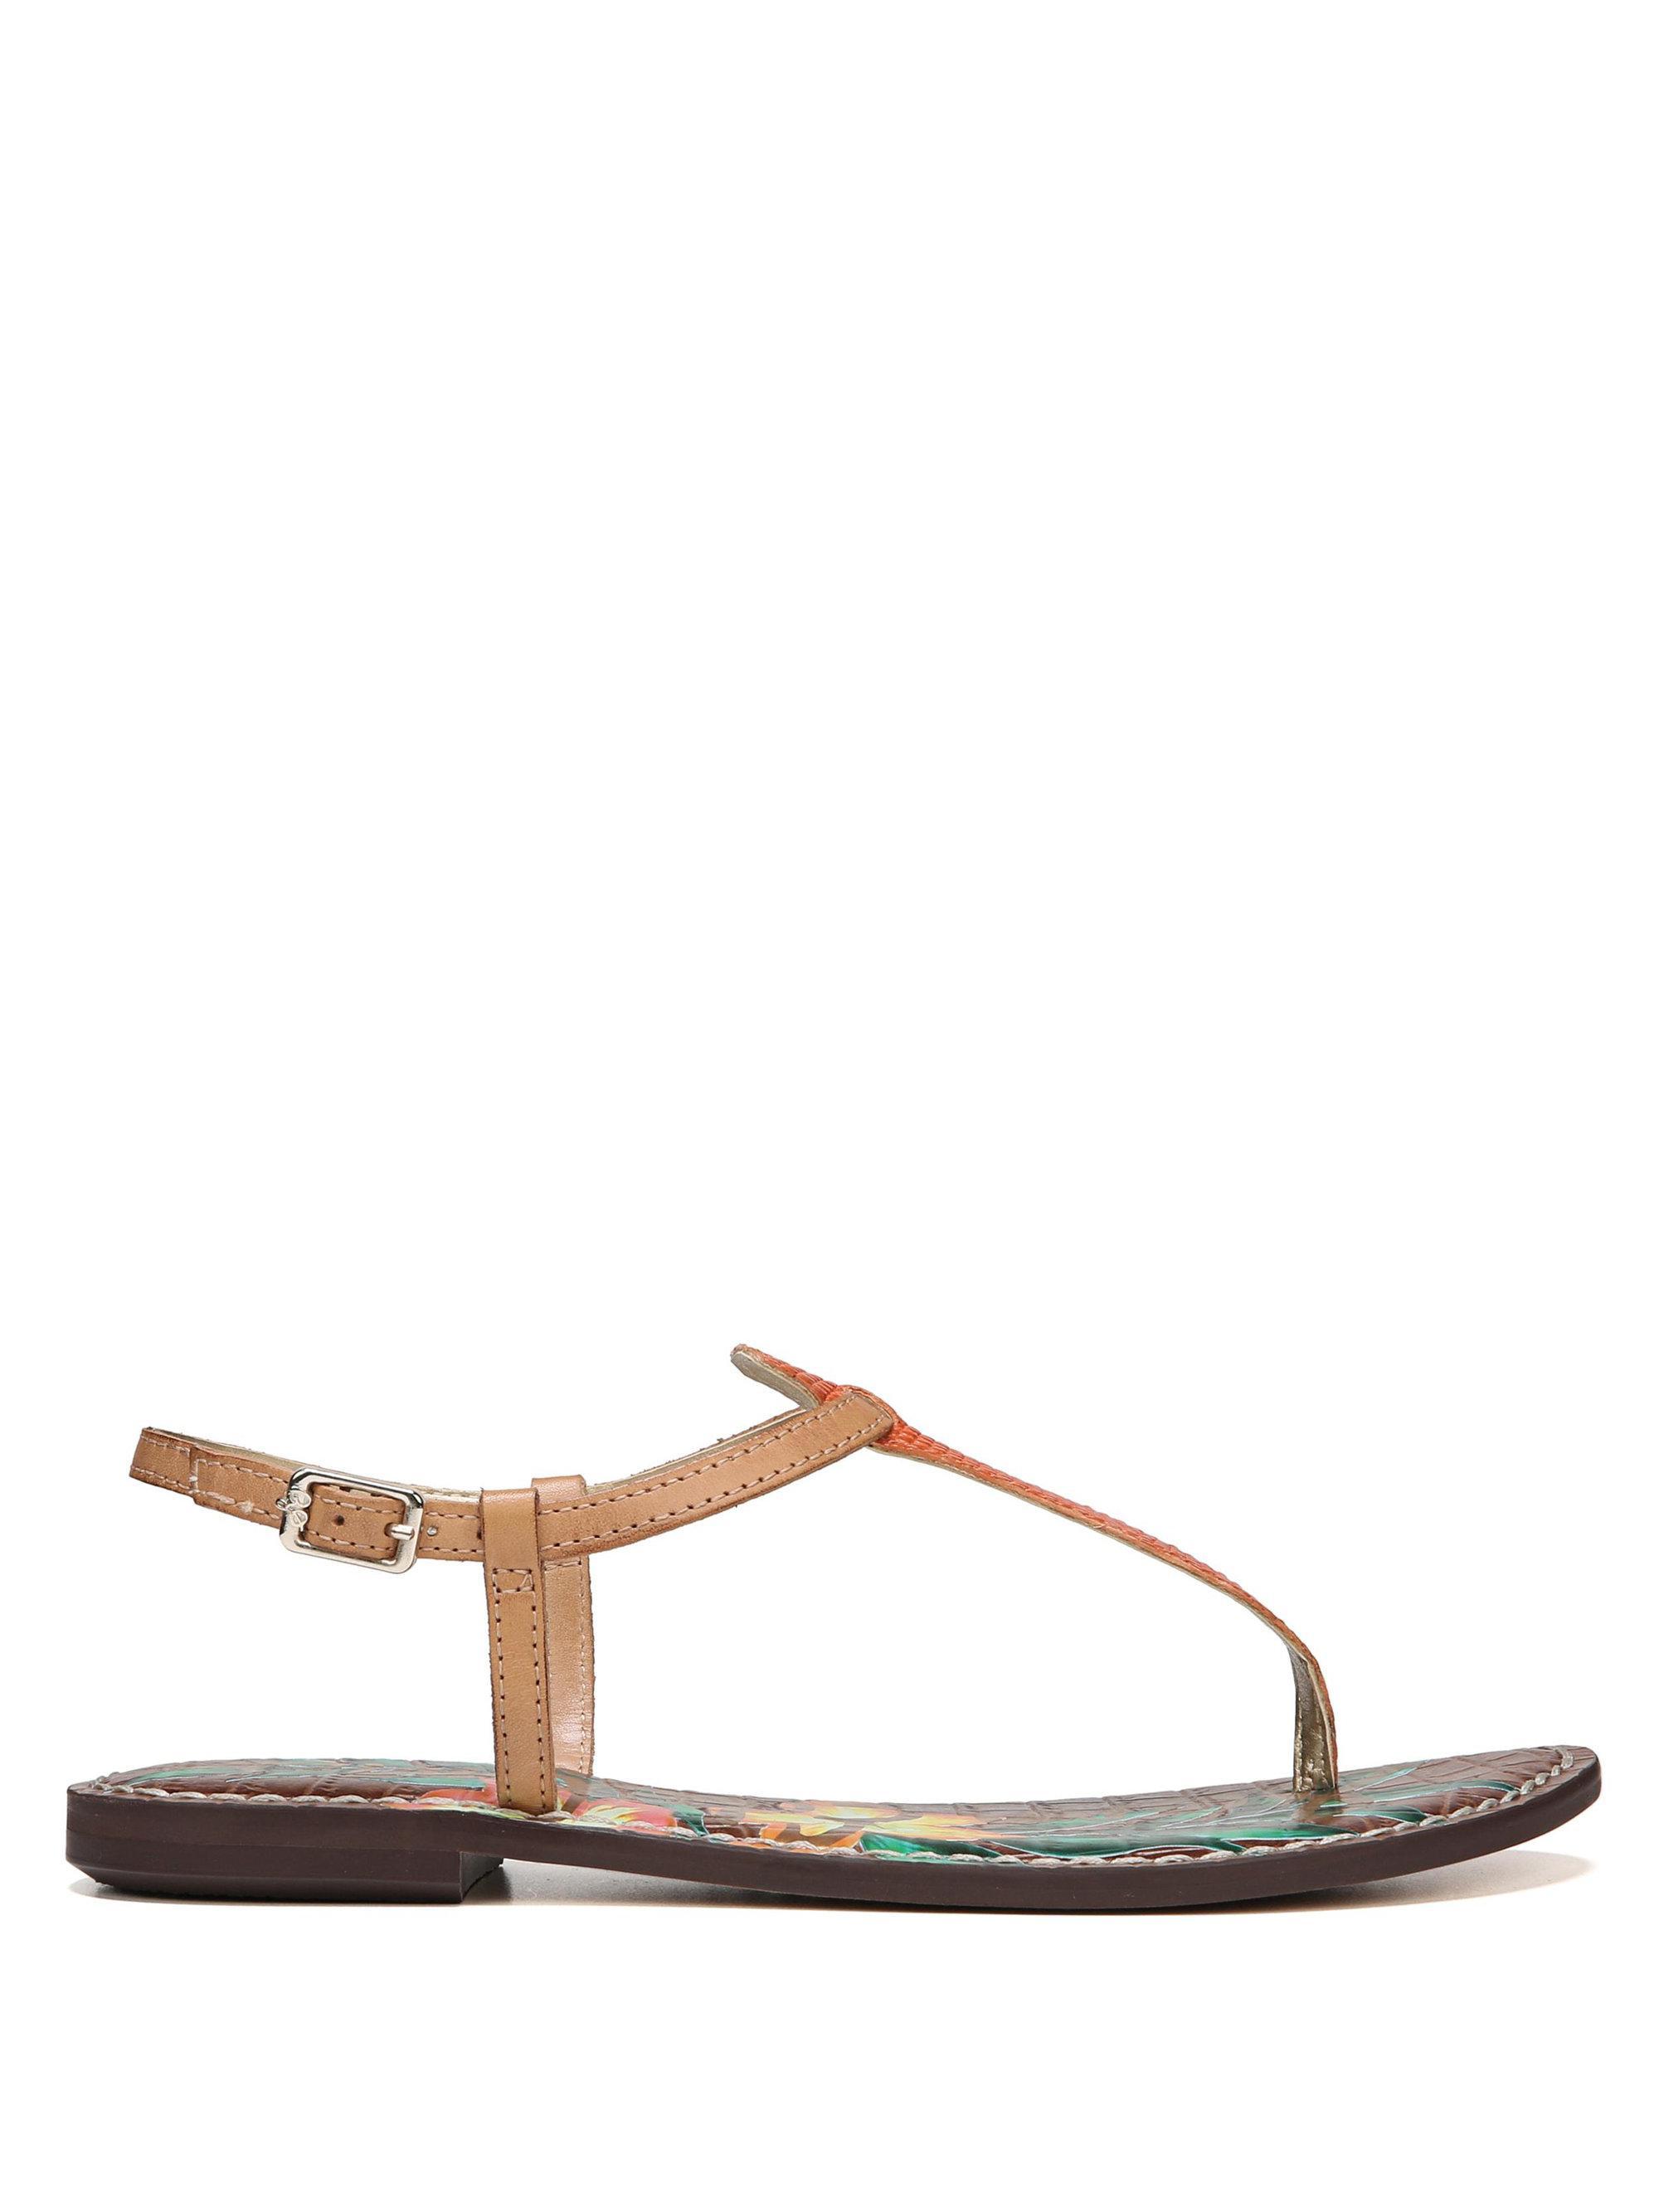 Sam Edelman Gigi Lizard Print Floral Leather Thong Sandals LUzkY46